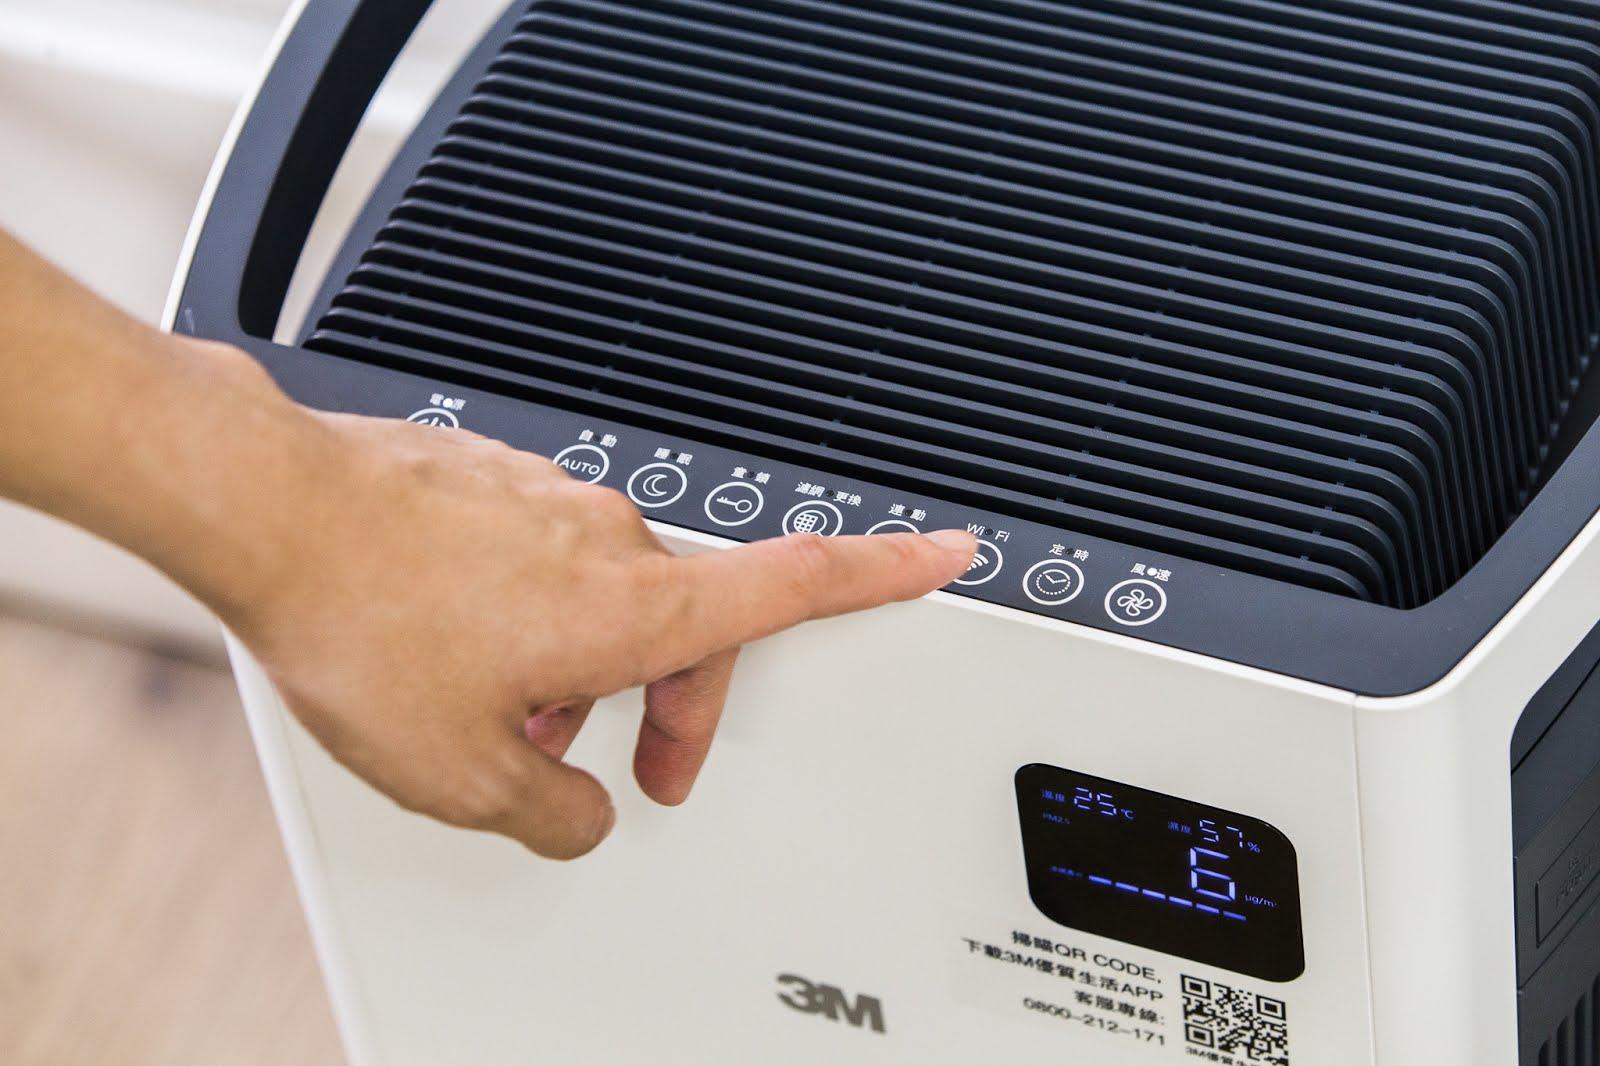 3M%2BFA-S500_dj%25E7%2590%25A6%25E7%2590%25A6_wwwhostkikicom_%25E9%2598%25BF%25E5%258C%2585%25E9%2586%25AB%25E7%2594%259F%25E6%258C%2589wifi.jpg-讓空氣跟家一樣令人安心│3M ™淨呼吸™全效型空氣清淨機─機皇級FA-S500